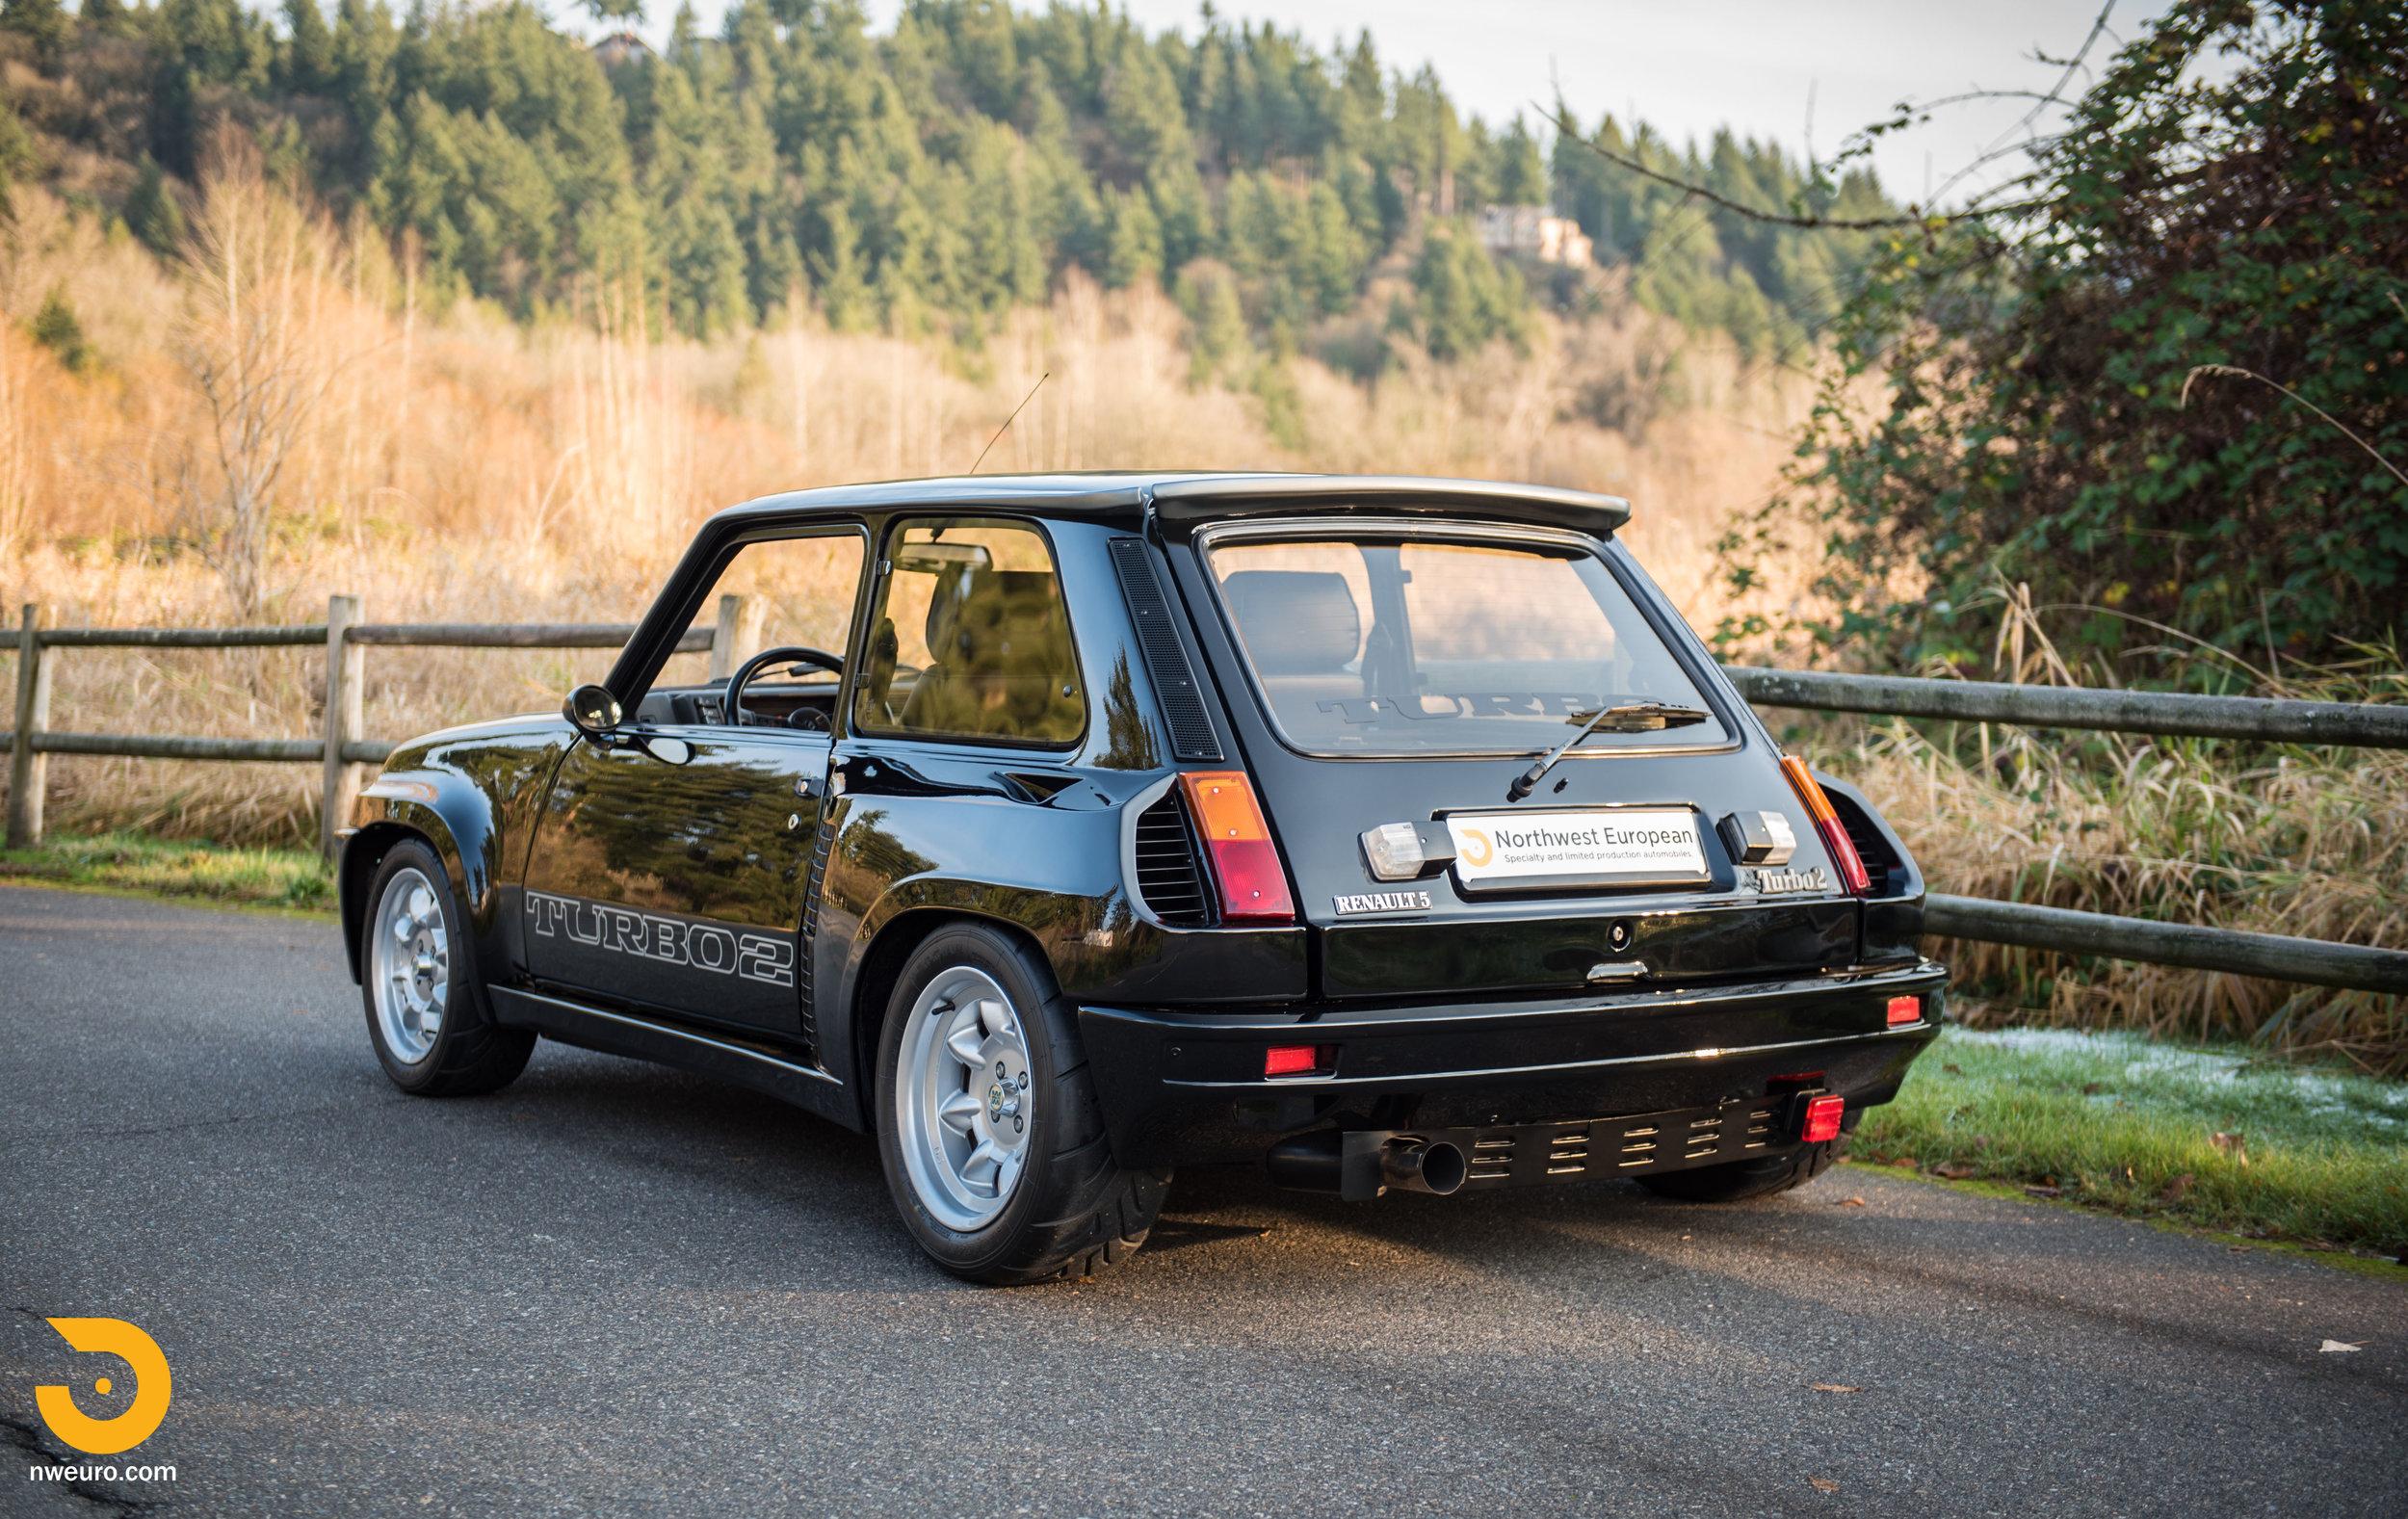 1983 Renault R5 Turbo 2 Black at Park-12.jpg